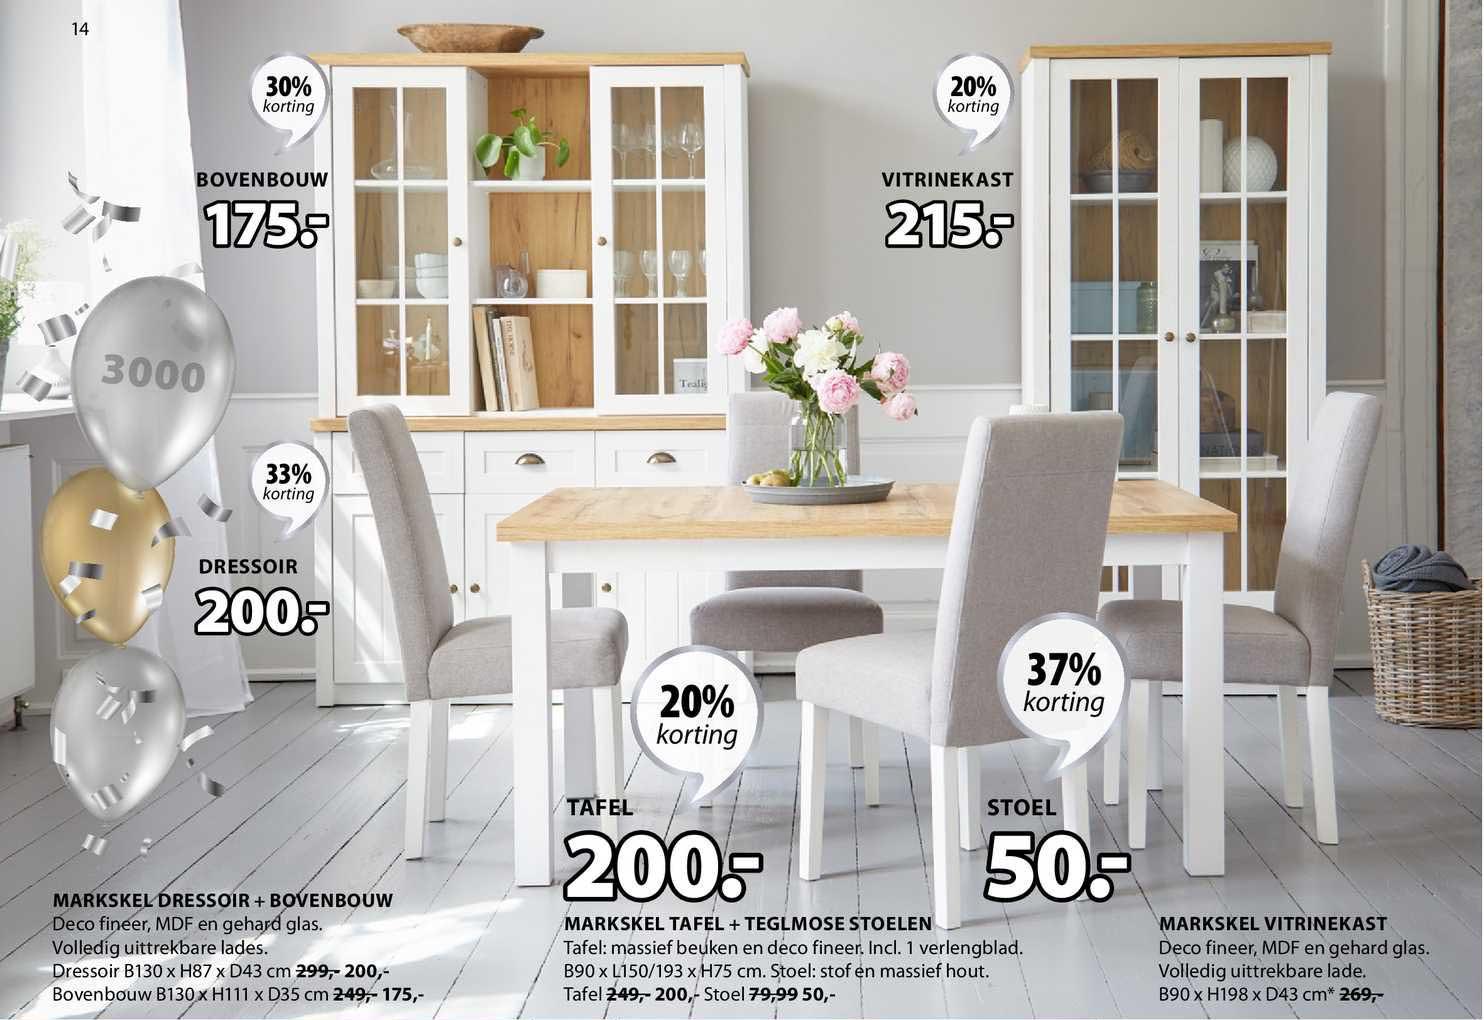 Jysk Markskel Dressoir + Bovenbouw, Markskel Tafel + Teglmose Stoelen Of Markskel Vitrinekast 20% - 37% Korting